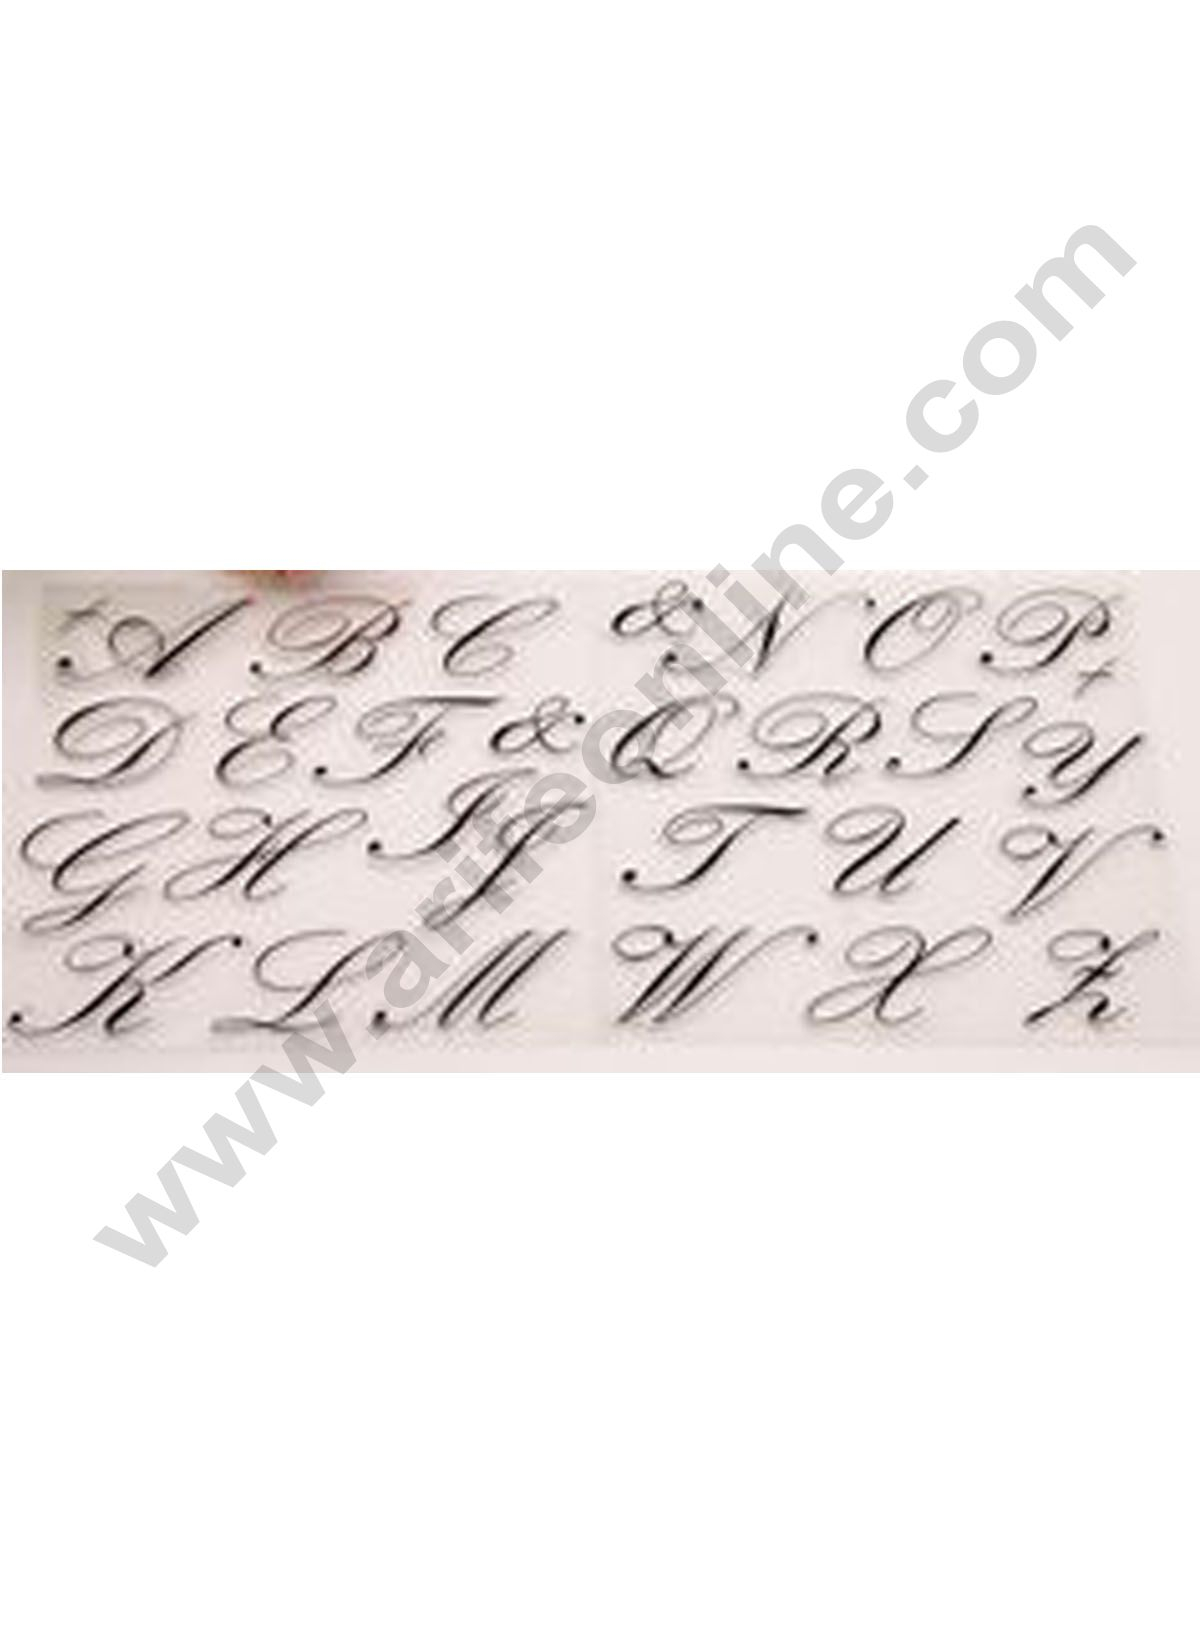 Cake Decor 1Pc Silicone Cursive Alphabet Scrapbook Diy Rubber Stamp Clear  Stamp Transparent Stamp Handmade Card Stamp